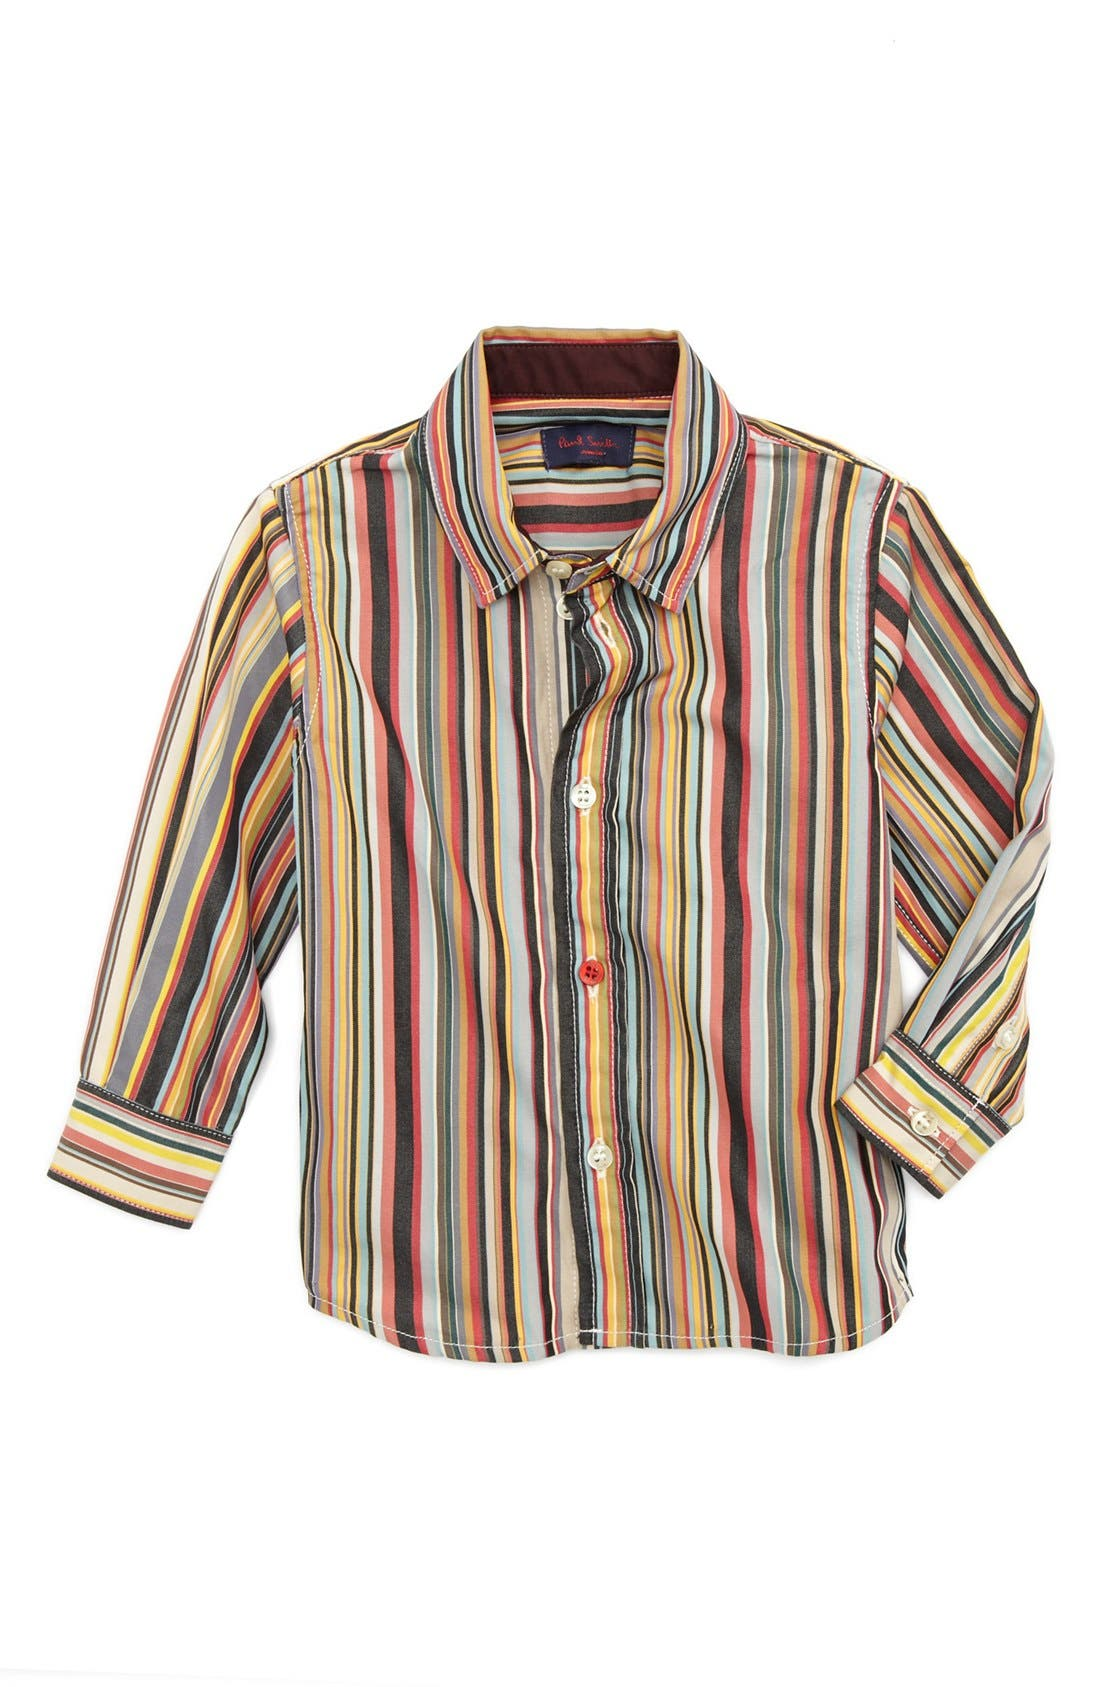 Alternate Image 1 Selected - Paul Smith Junior Sport Shirt (Baby Boys)